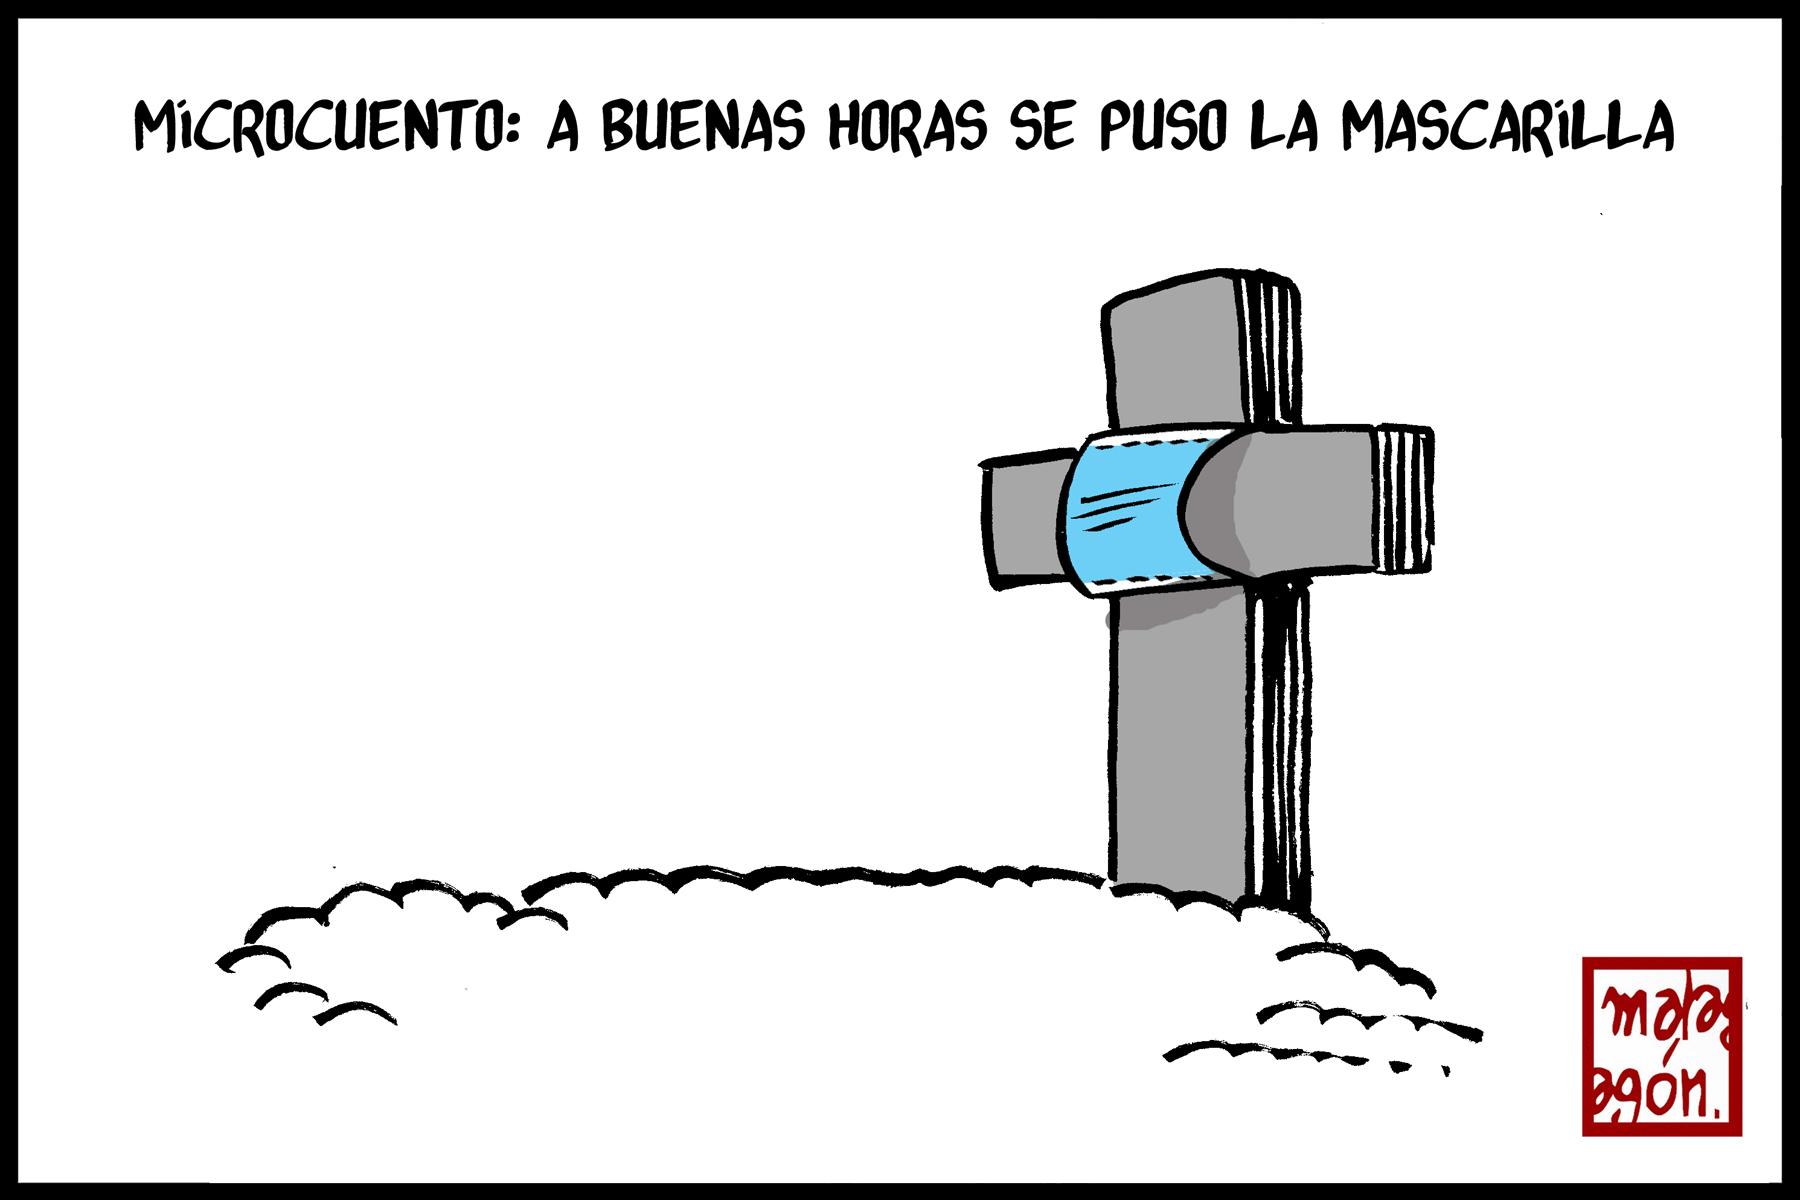 <p>Microcuento.</p>